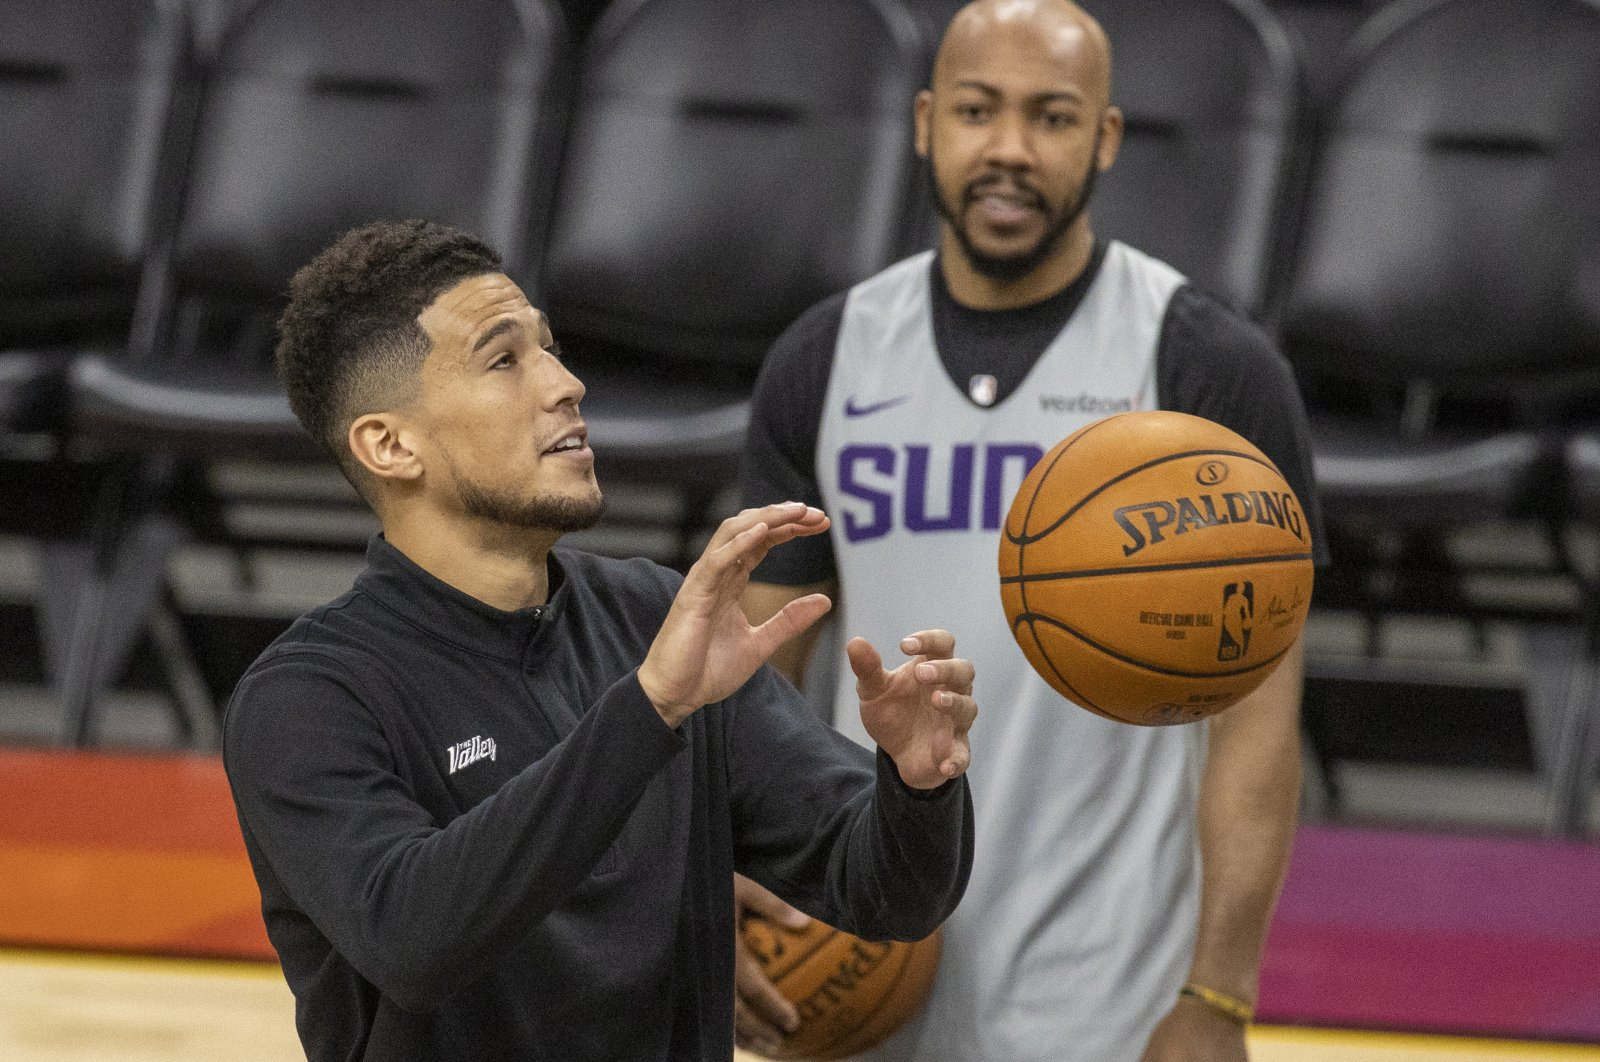 Phoenix Suns guard Devin Booker catches a pass during practice for the NBA Finals against Milwaukee Bucks at Phoenix Suns Arena, Phoenix, Arizona, U.S., July 7, 2021. (EPA Photo)